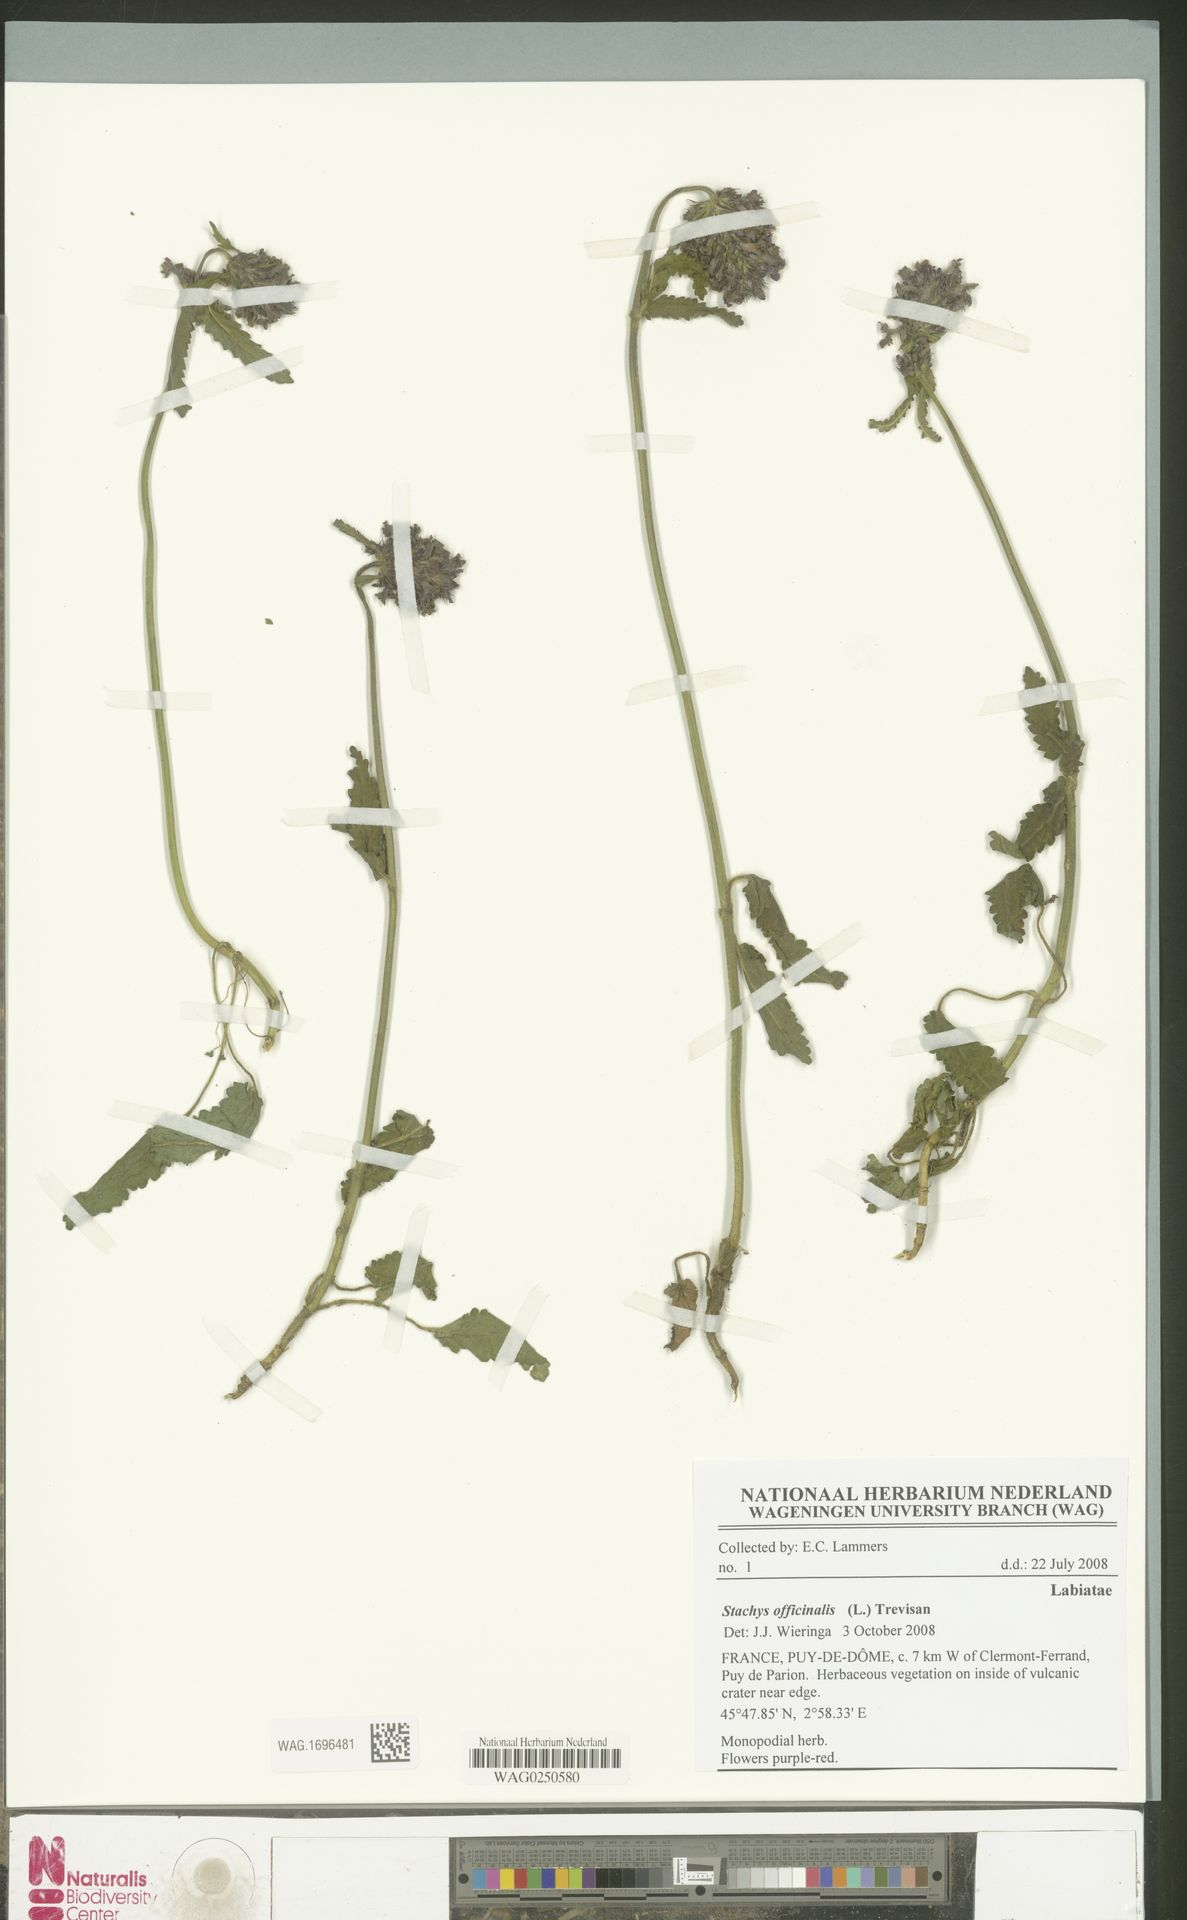 WAG.1696481 | Stachys officinalis (L.) Trevis.